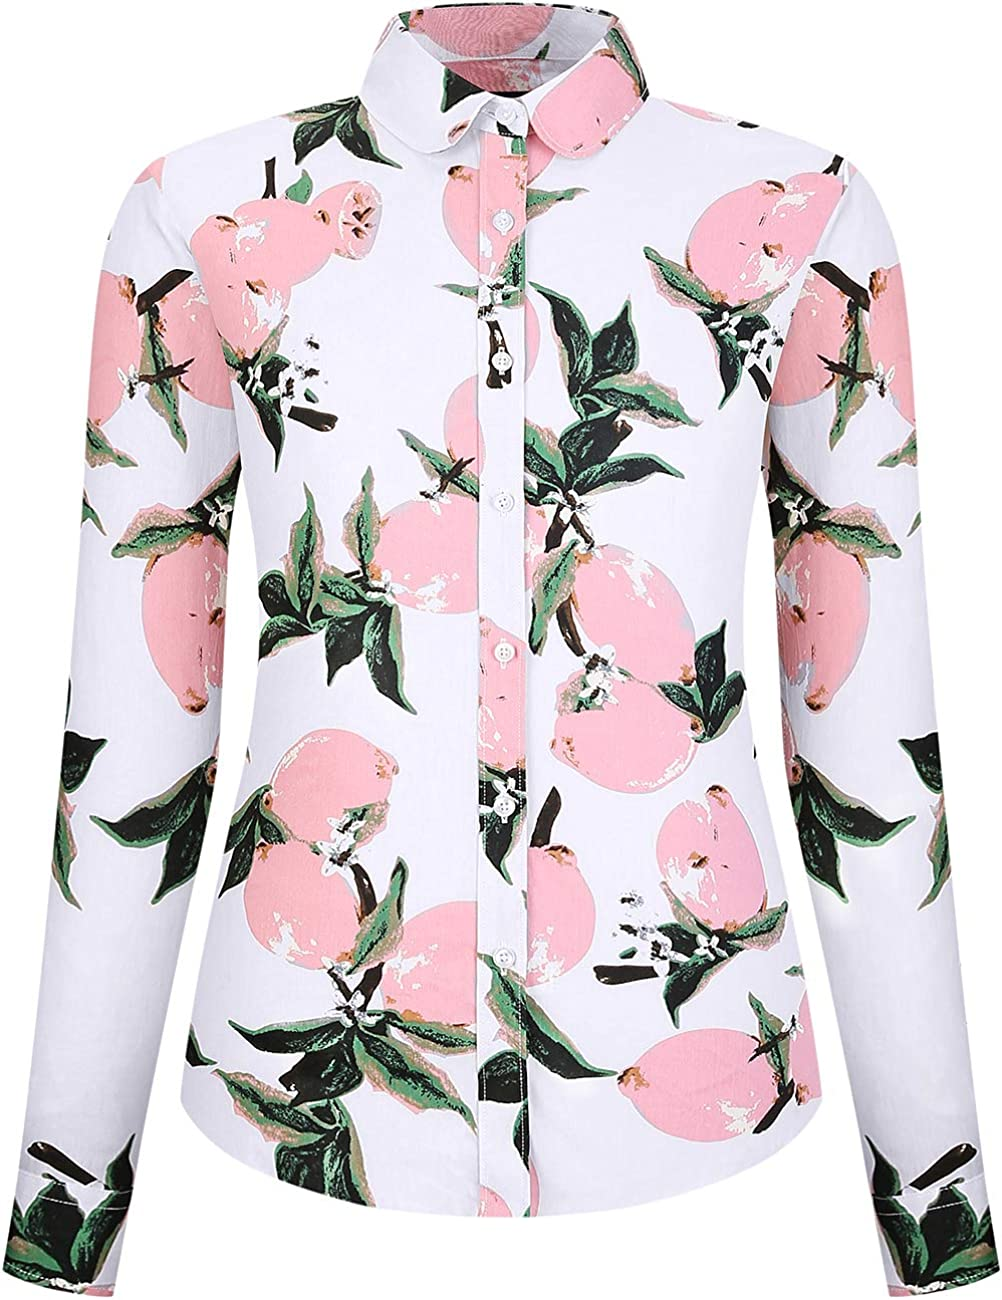 DOKKIA Women's Tops Casual Blouses Long Sleeve Work Button Up Dress Aloha Hawaiian Shirt